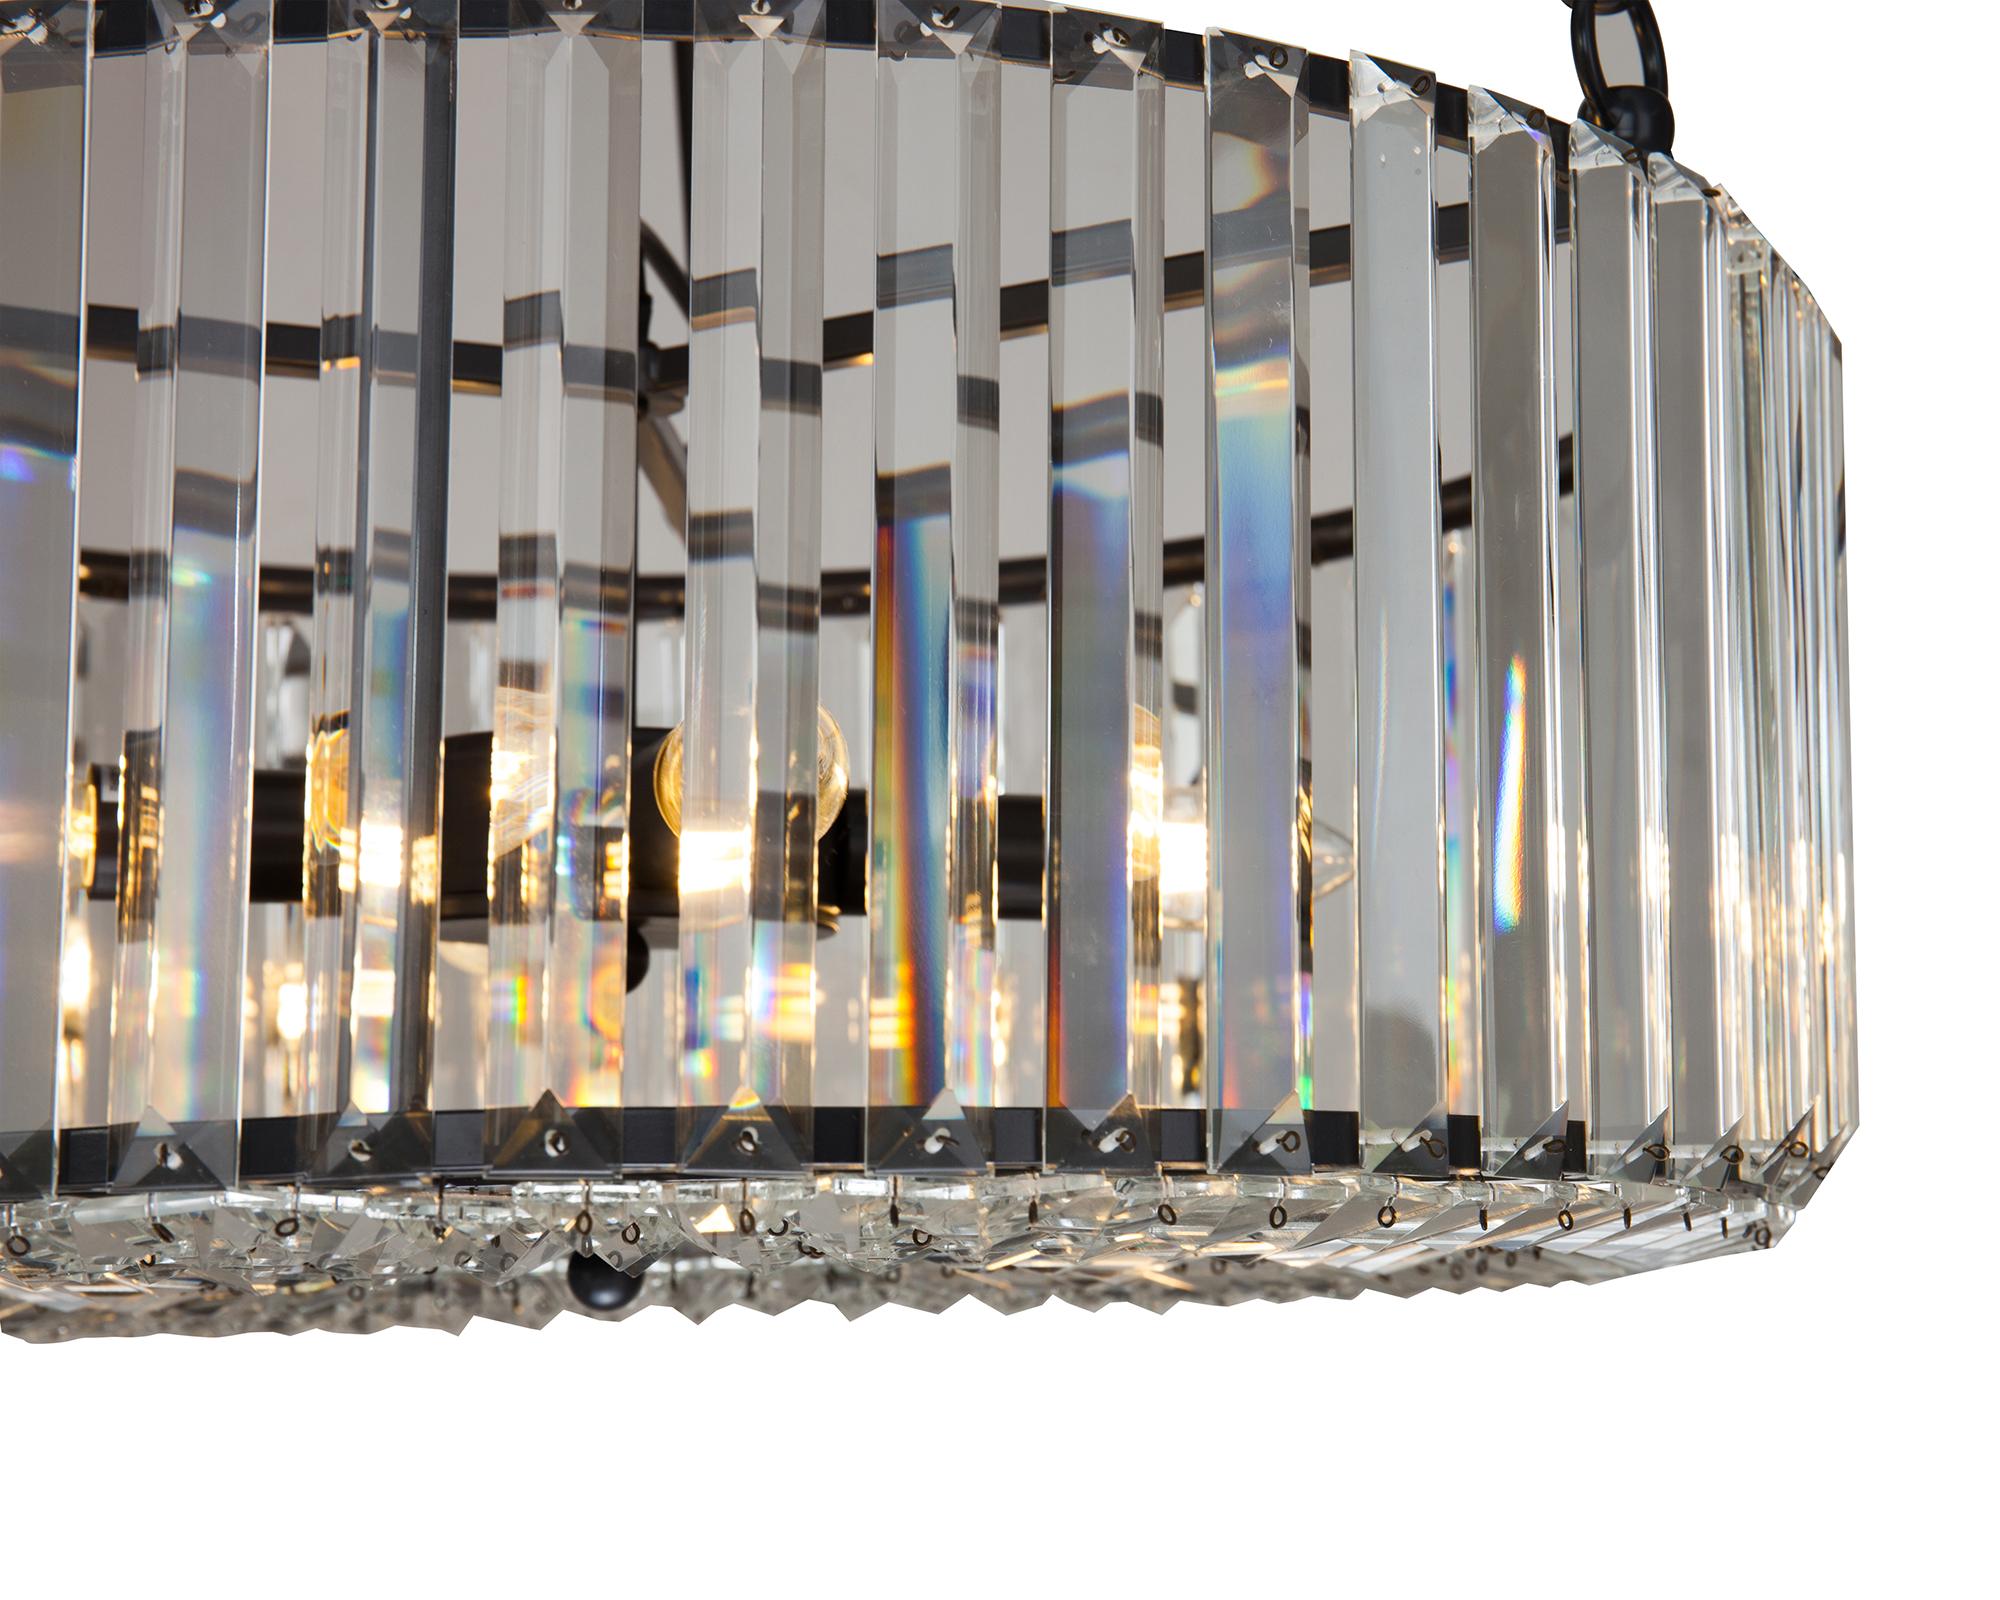 Liang & Eimil SUM-LGT-0212 Konar Pendant Light (4)